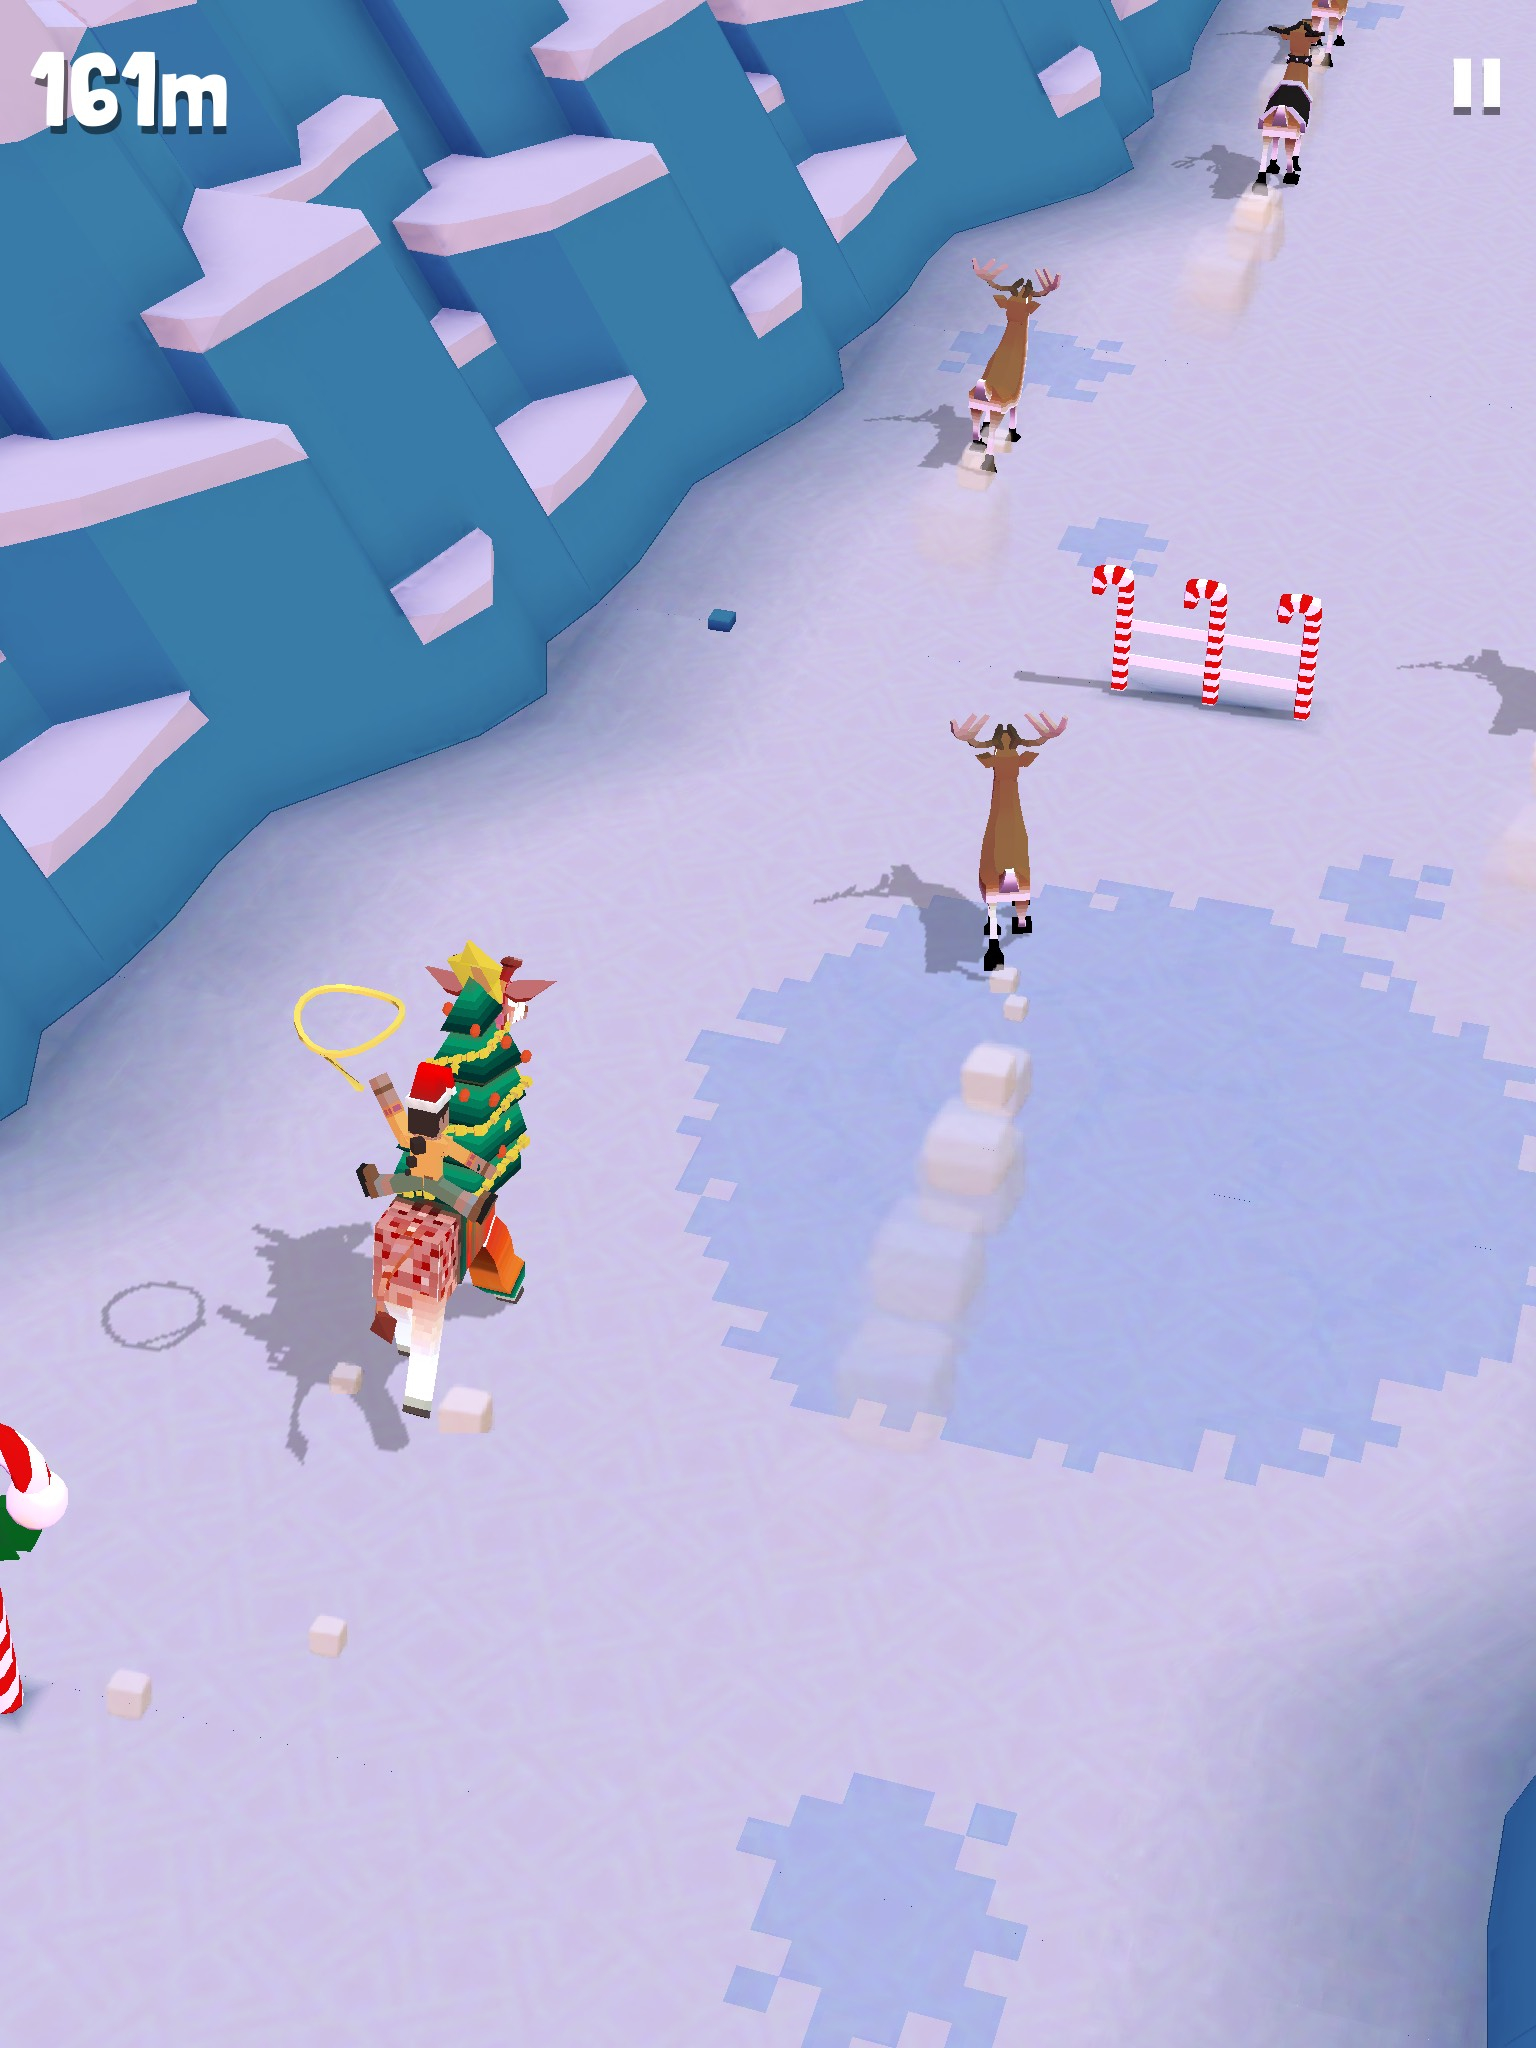 Christmas giraffe! 🎄🦒